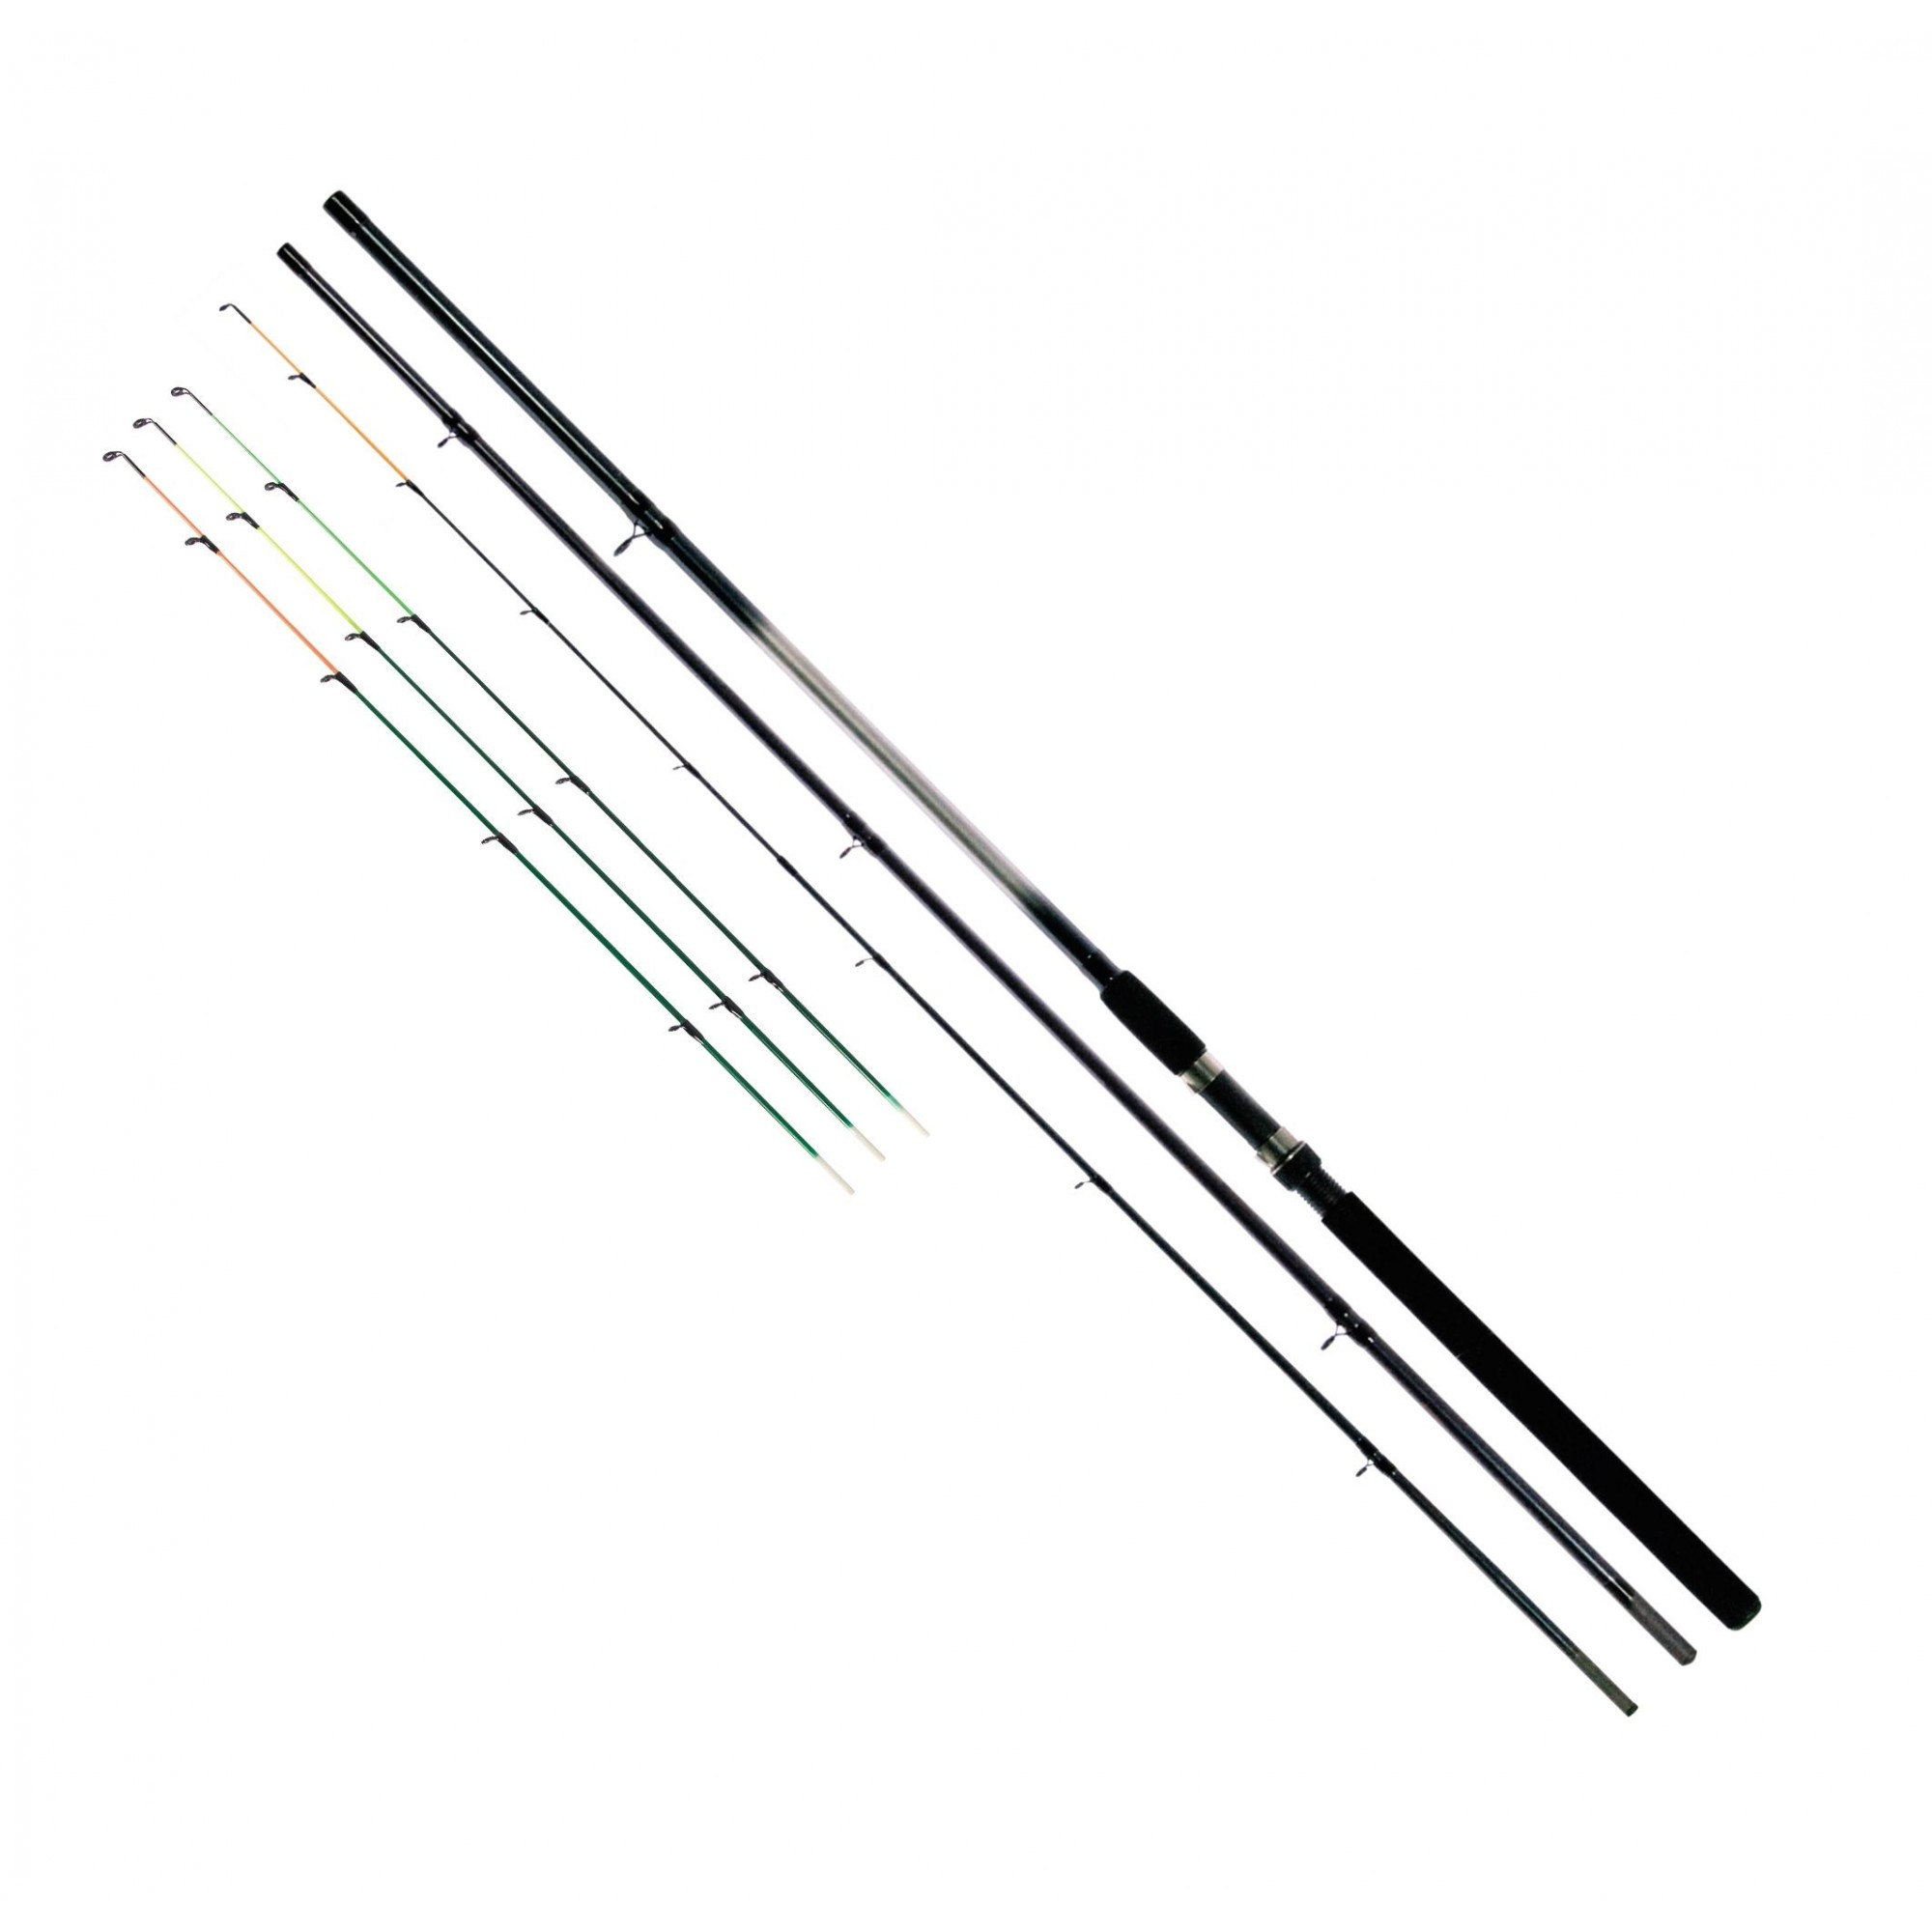 фидерное удилище bratfishing g-feeder rods